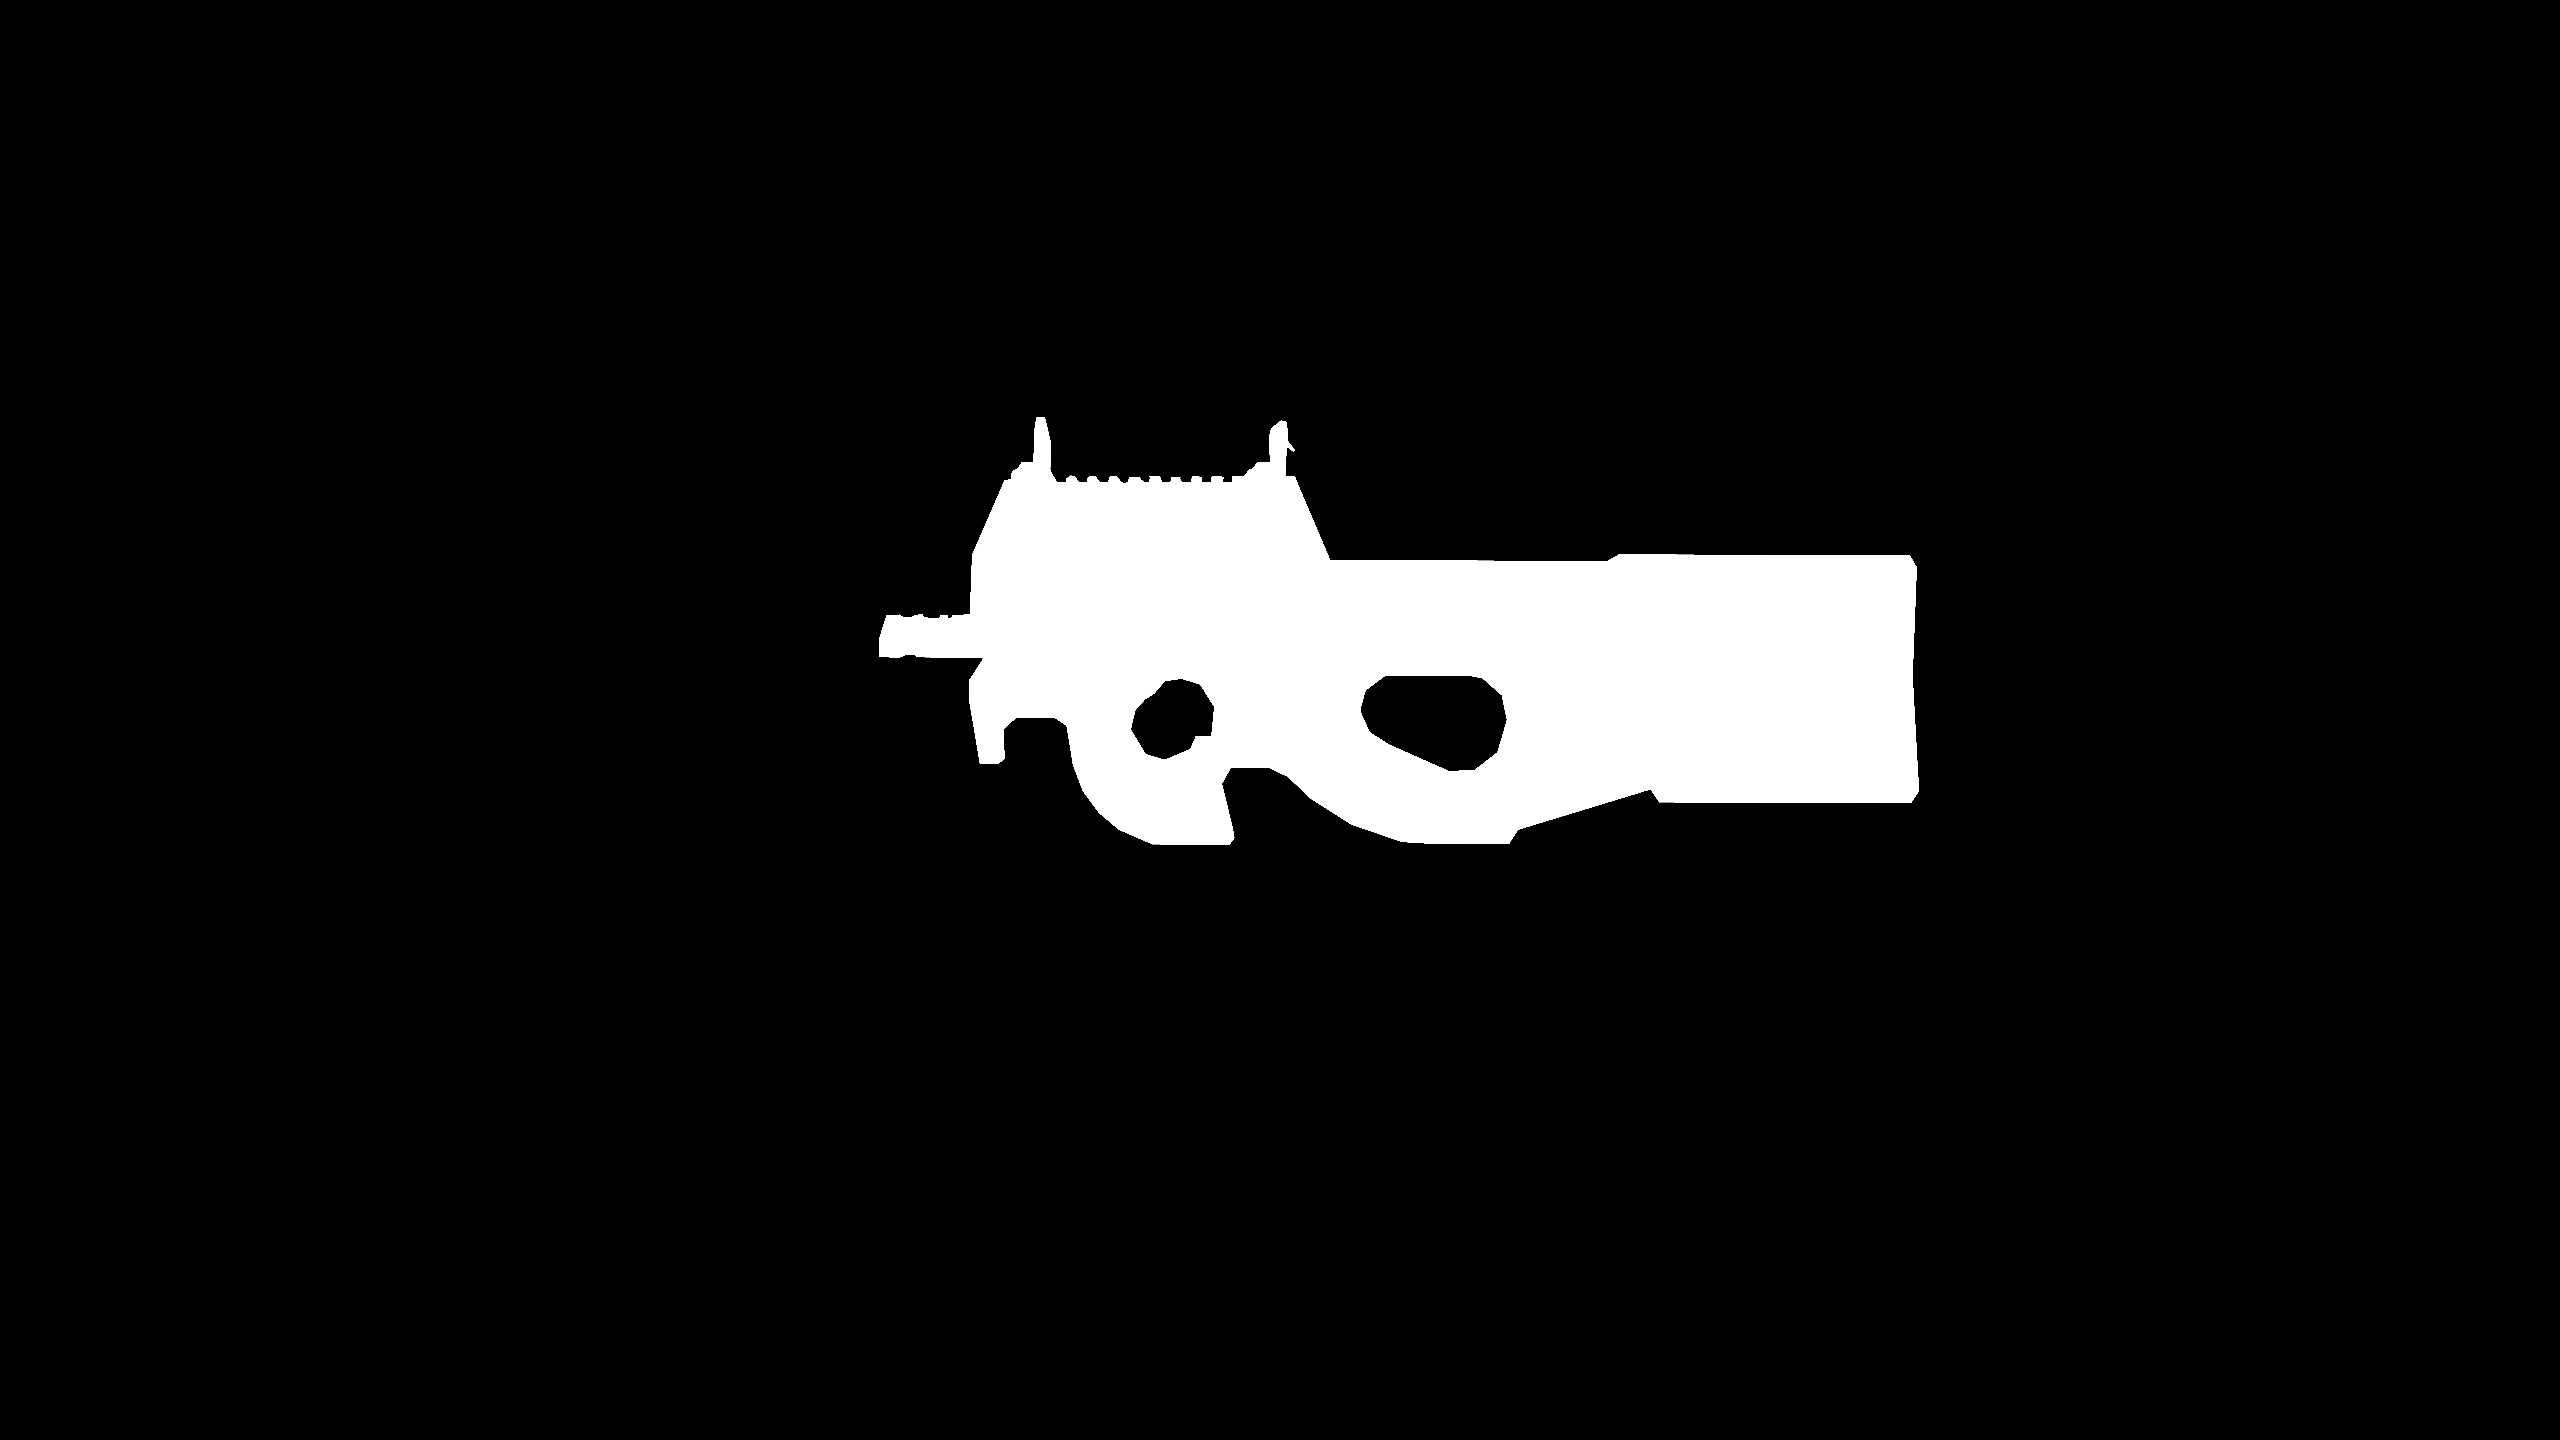 P90 umriss